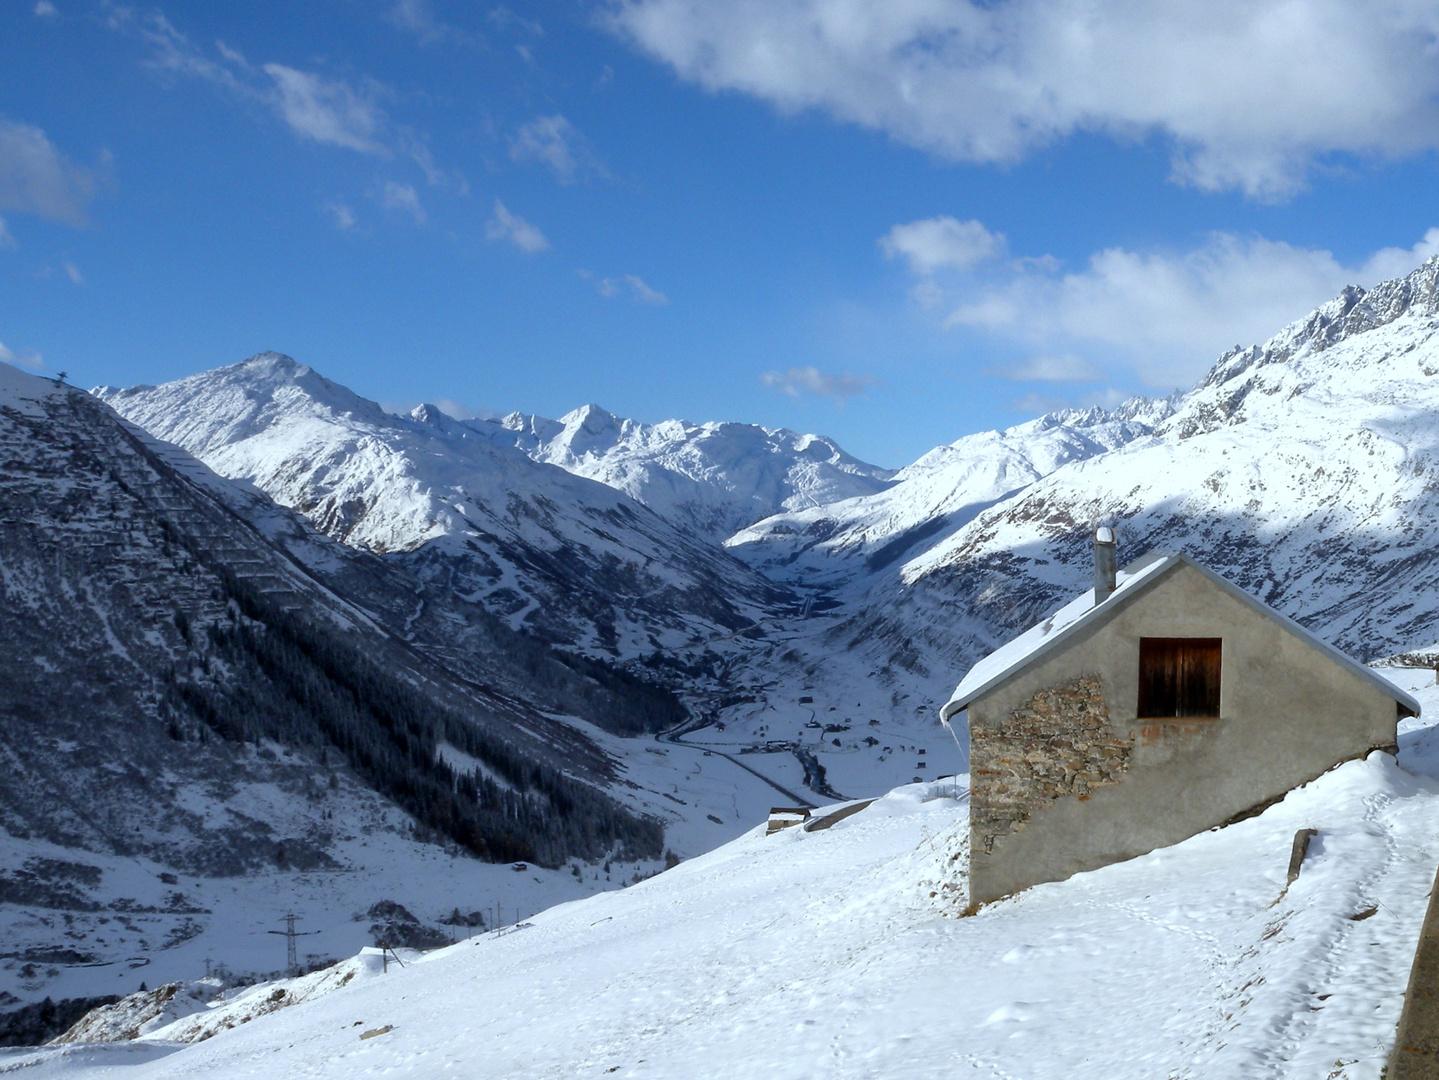 neige et ciel bleu..03